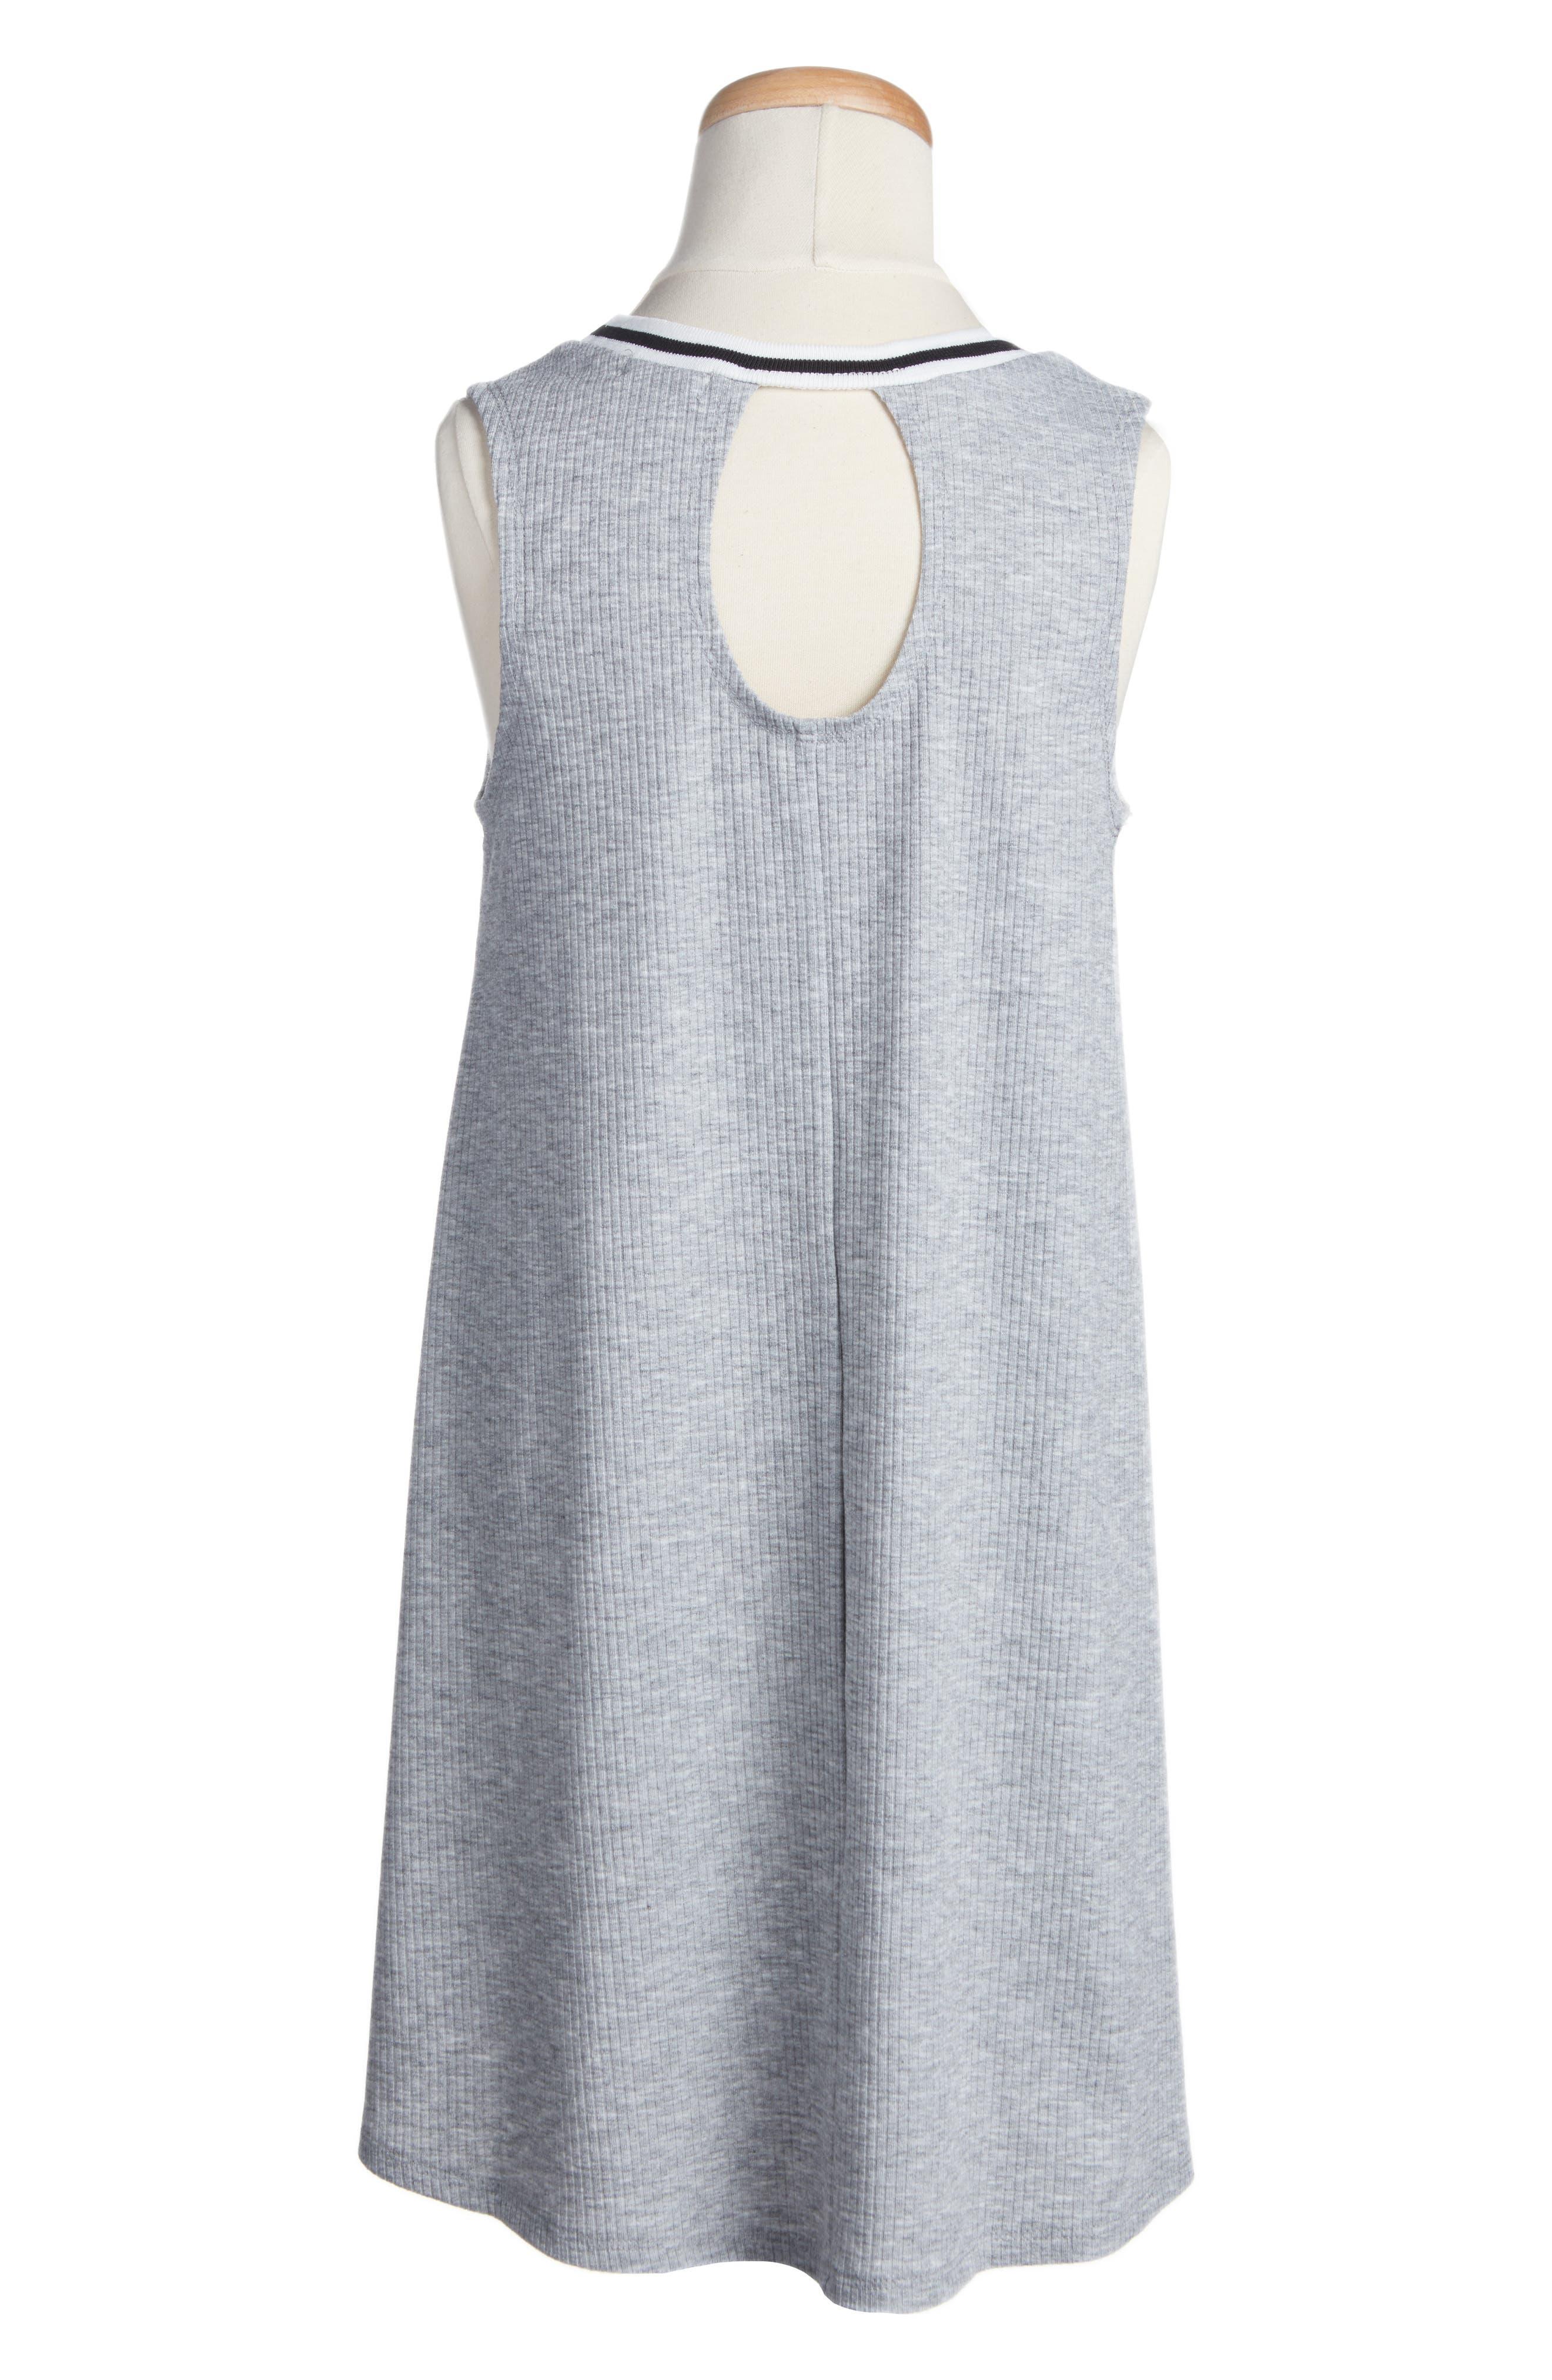 Ringer Tank Dress,                             Alternate thumbnail 2, color,                             Heather Gray